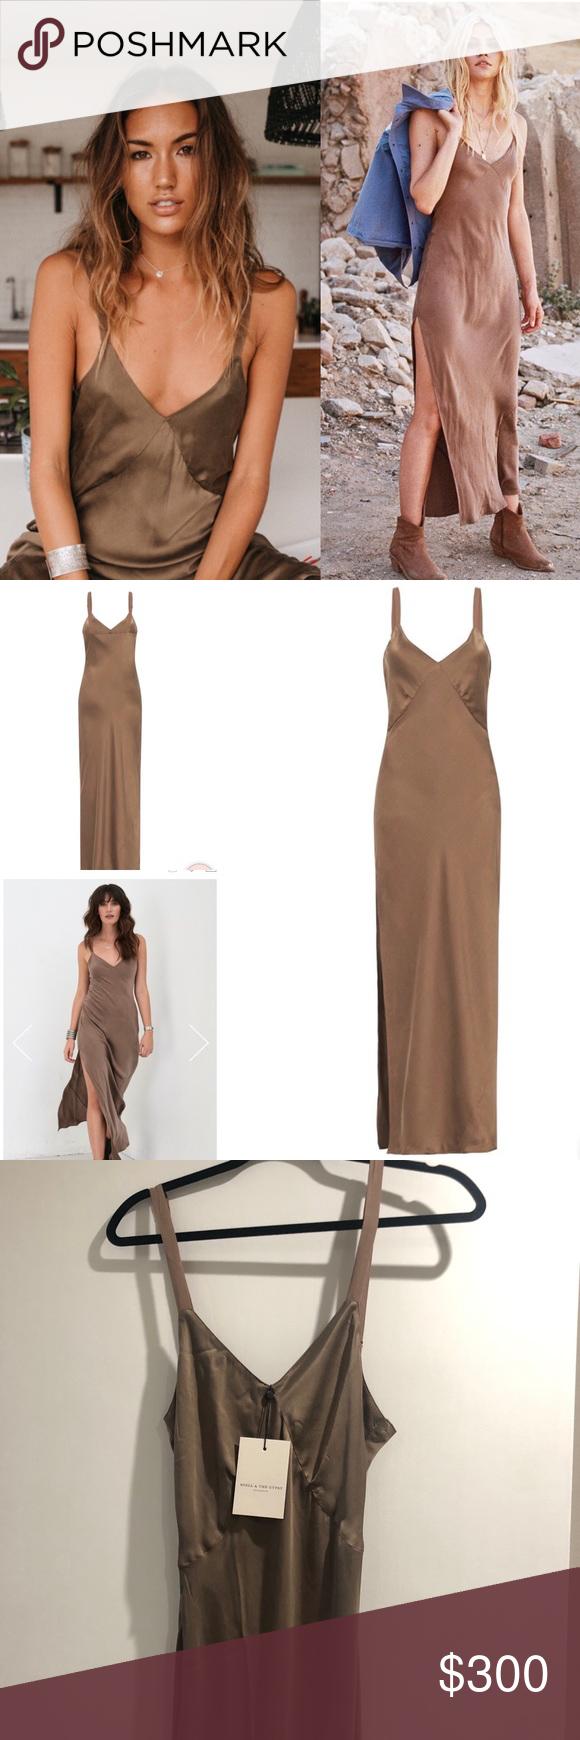 06e432594771 Love Cabin Silk Slip SOLD OUT Our ever-seductive Cabin Love Silk Slip Dress  is